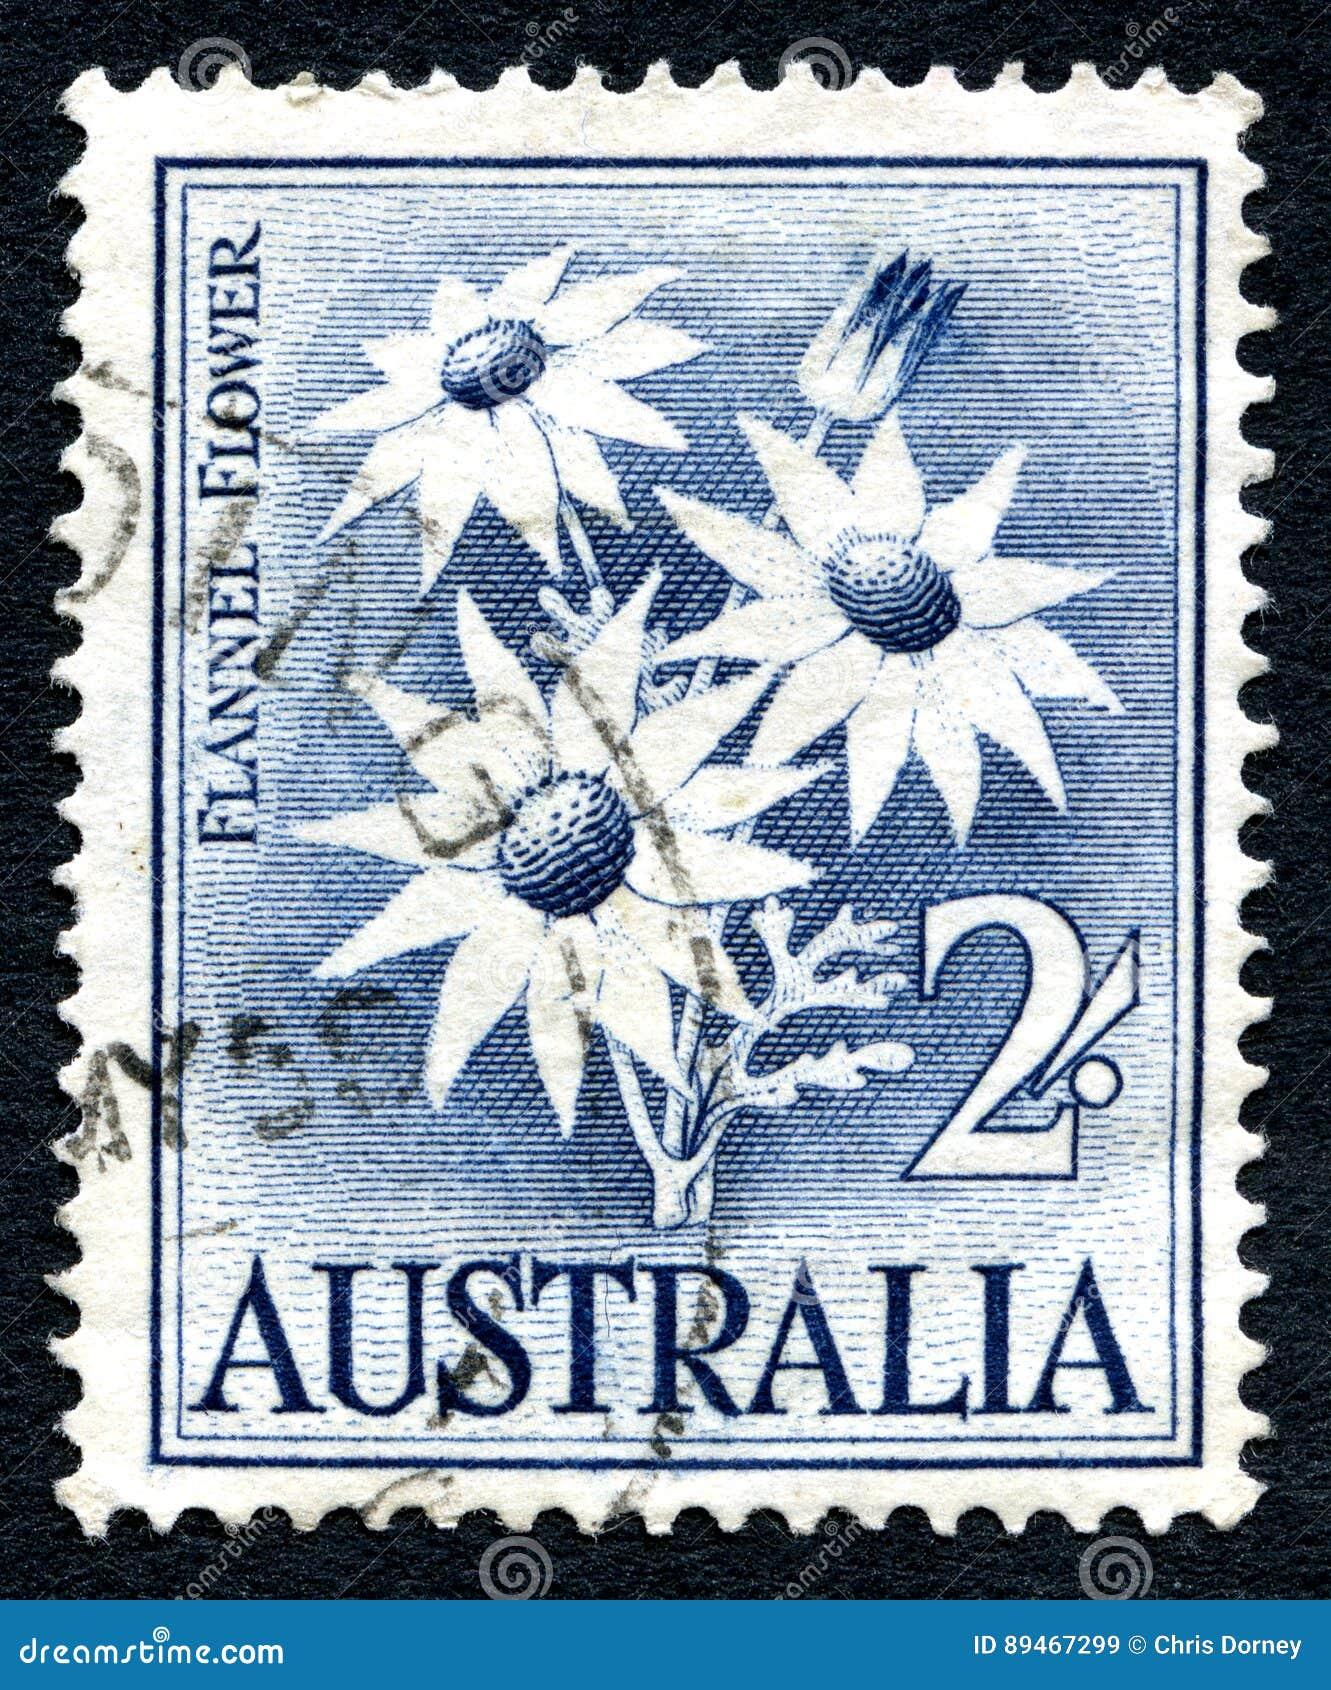 Date stamp in Sydney